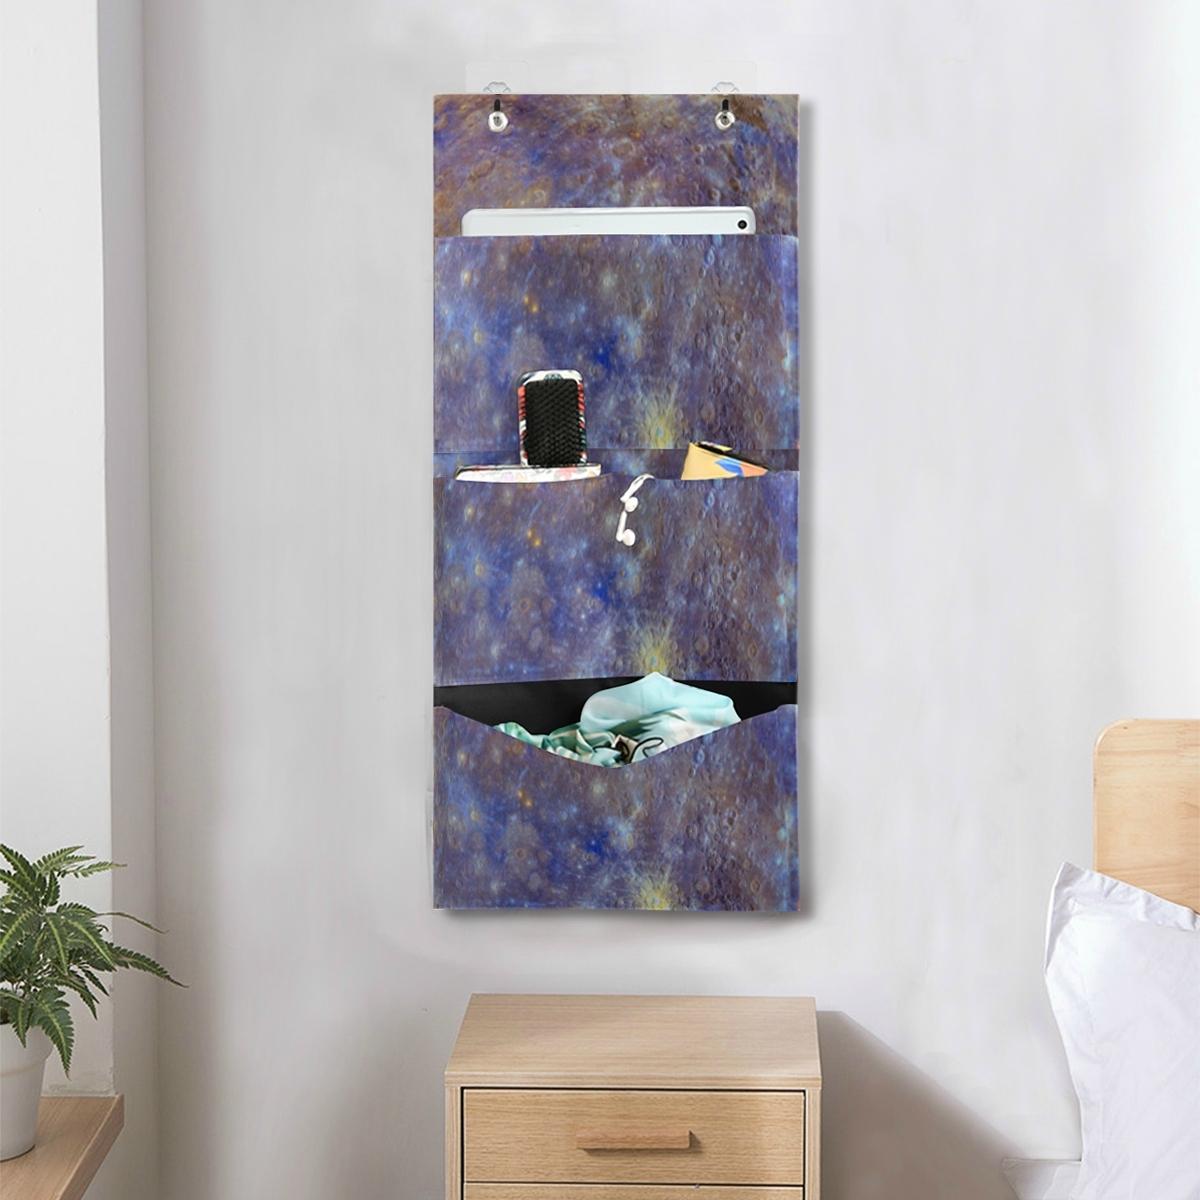 Door Wall Mount Hanging Organizer Beautiful Magical Magic Lotus Kitchen Wall Han - $29.99